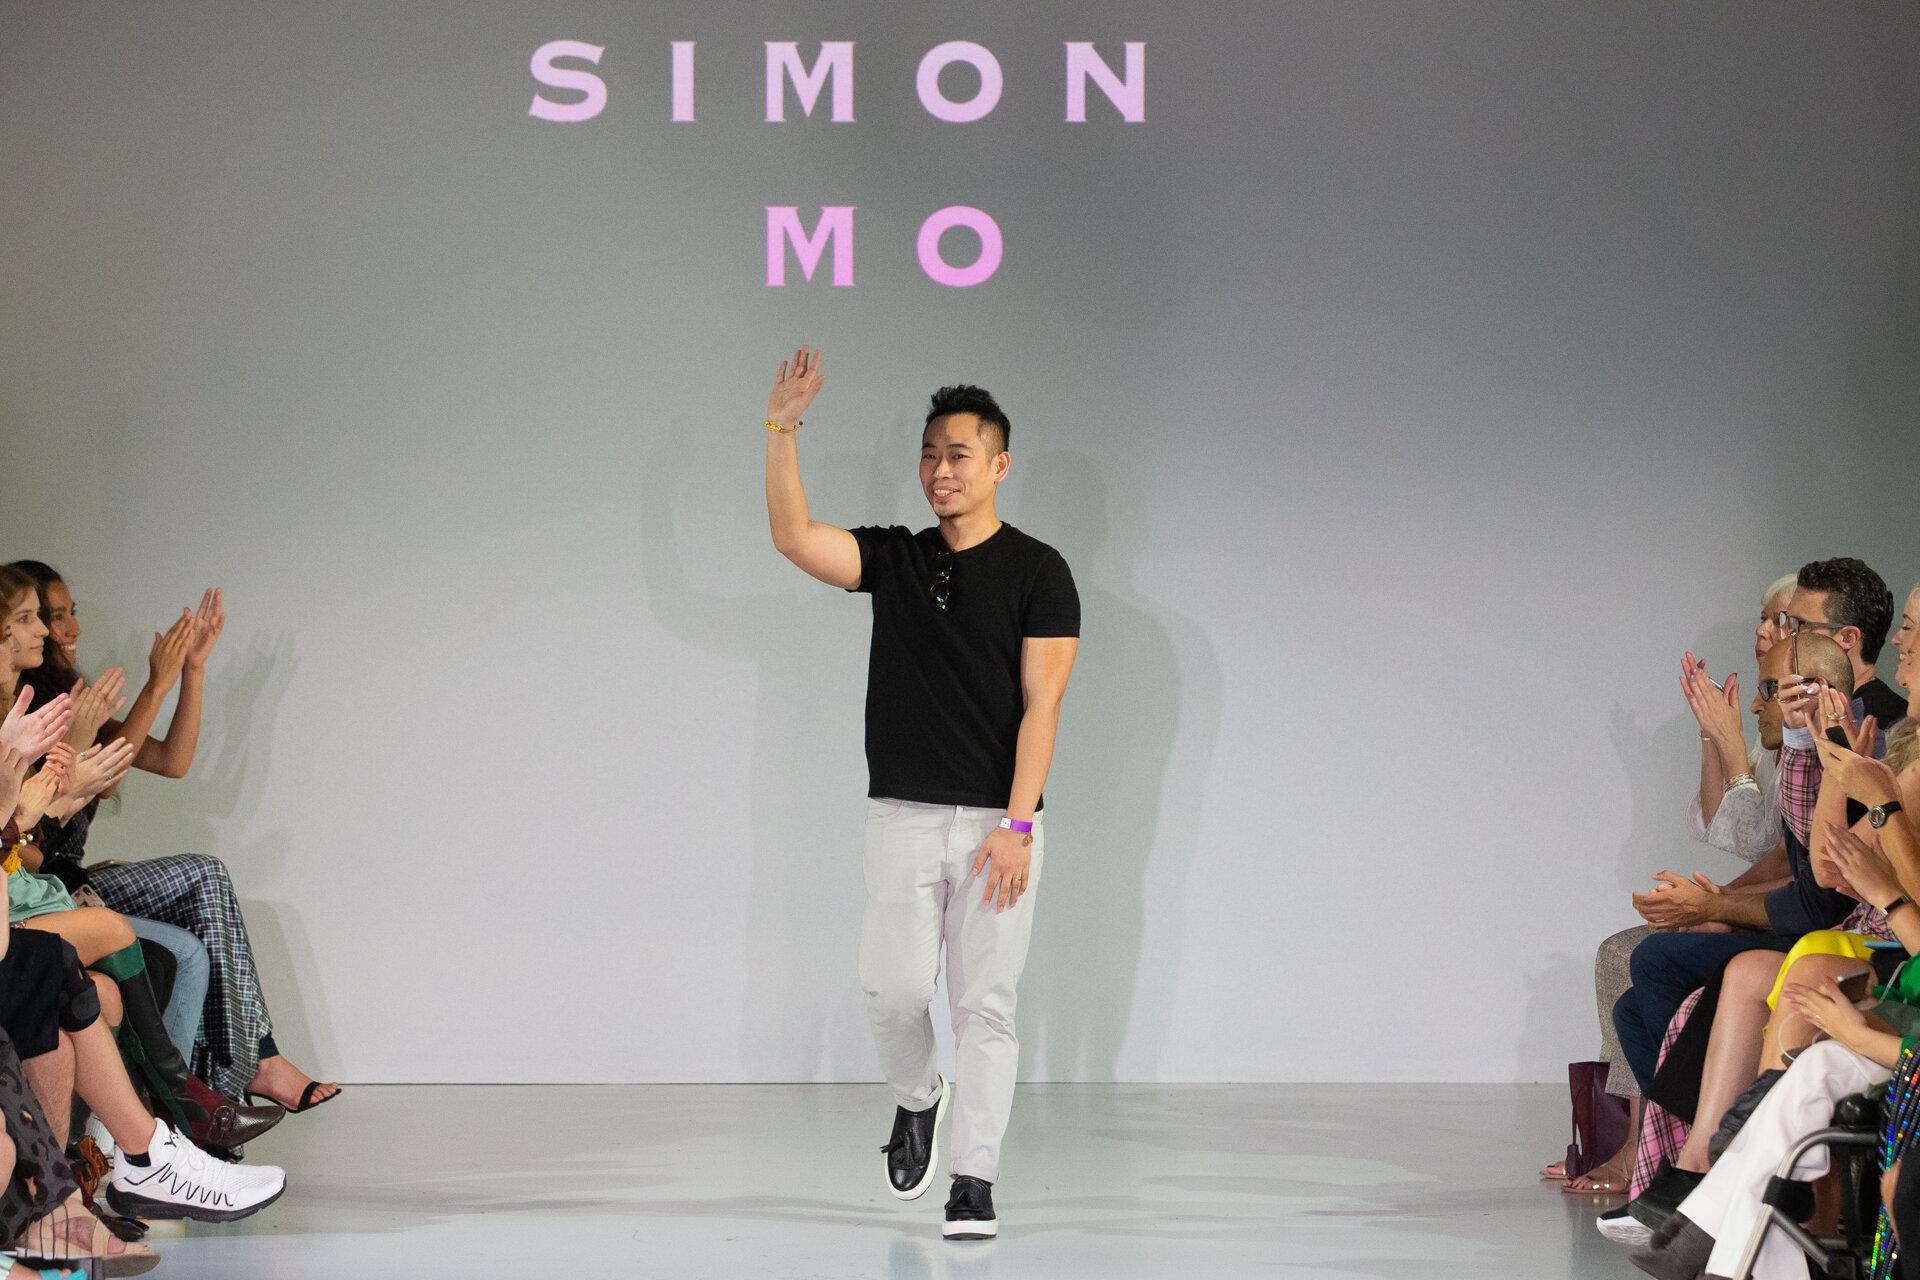 Simon_Mo_72dpi_029.jpg